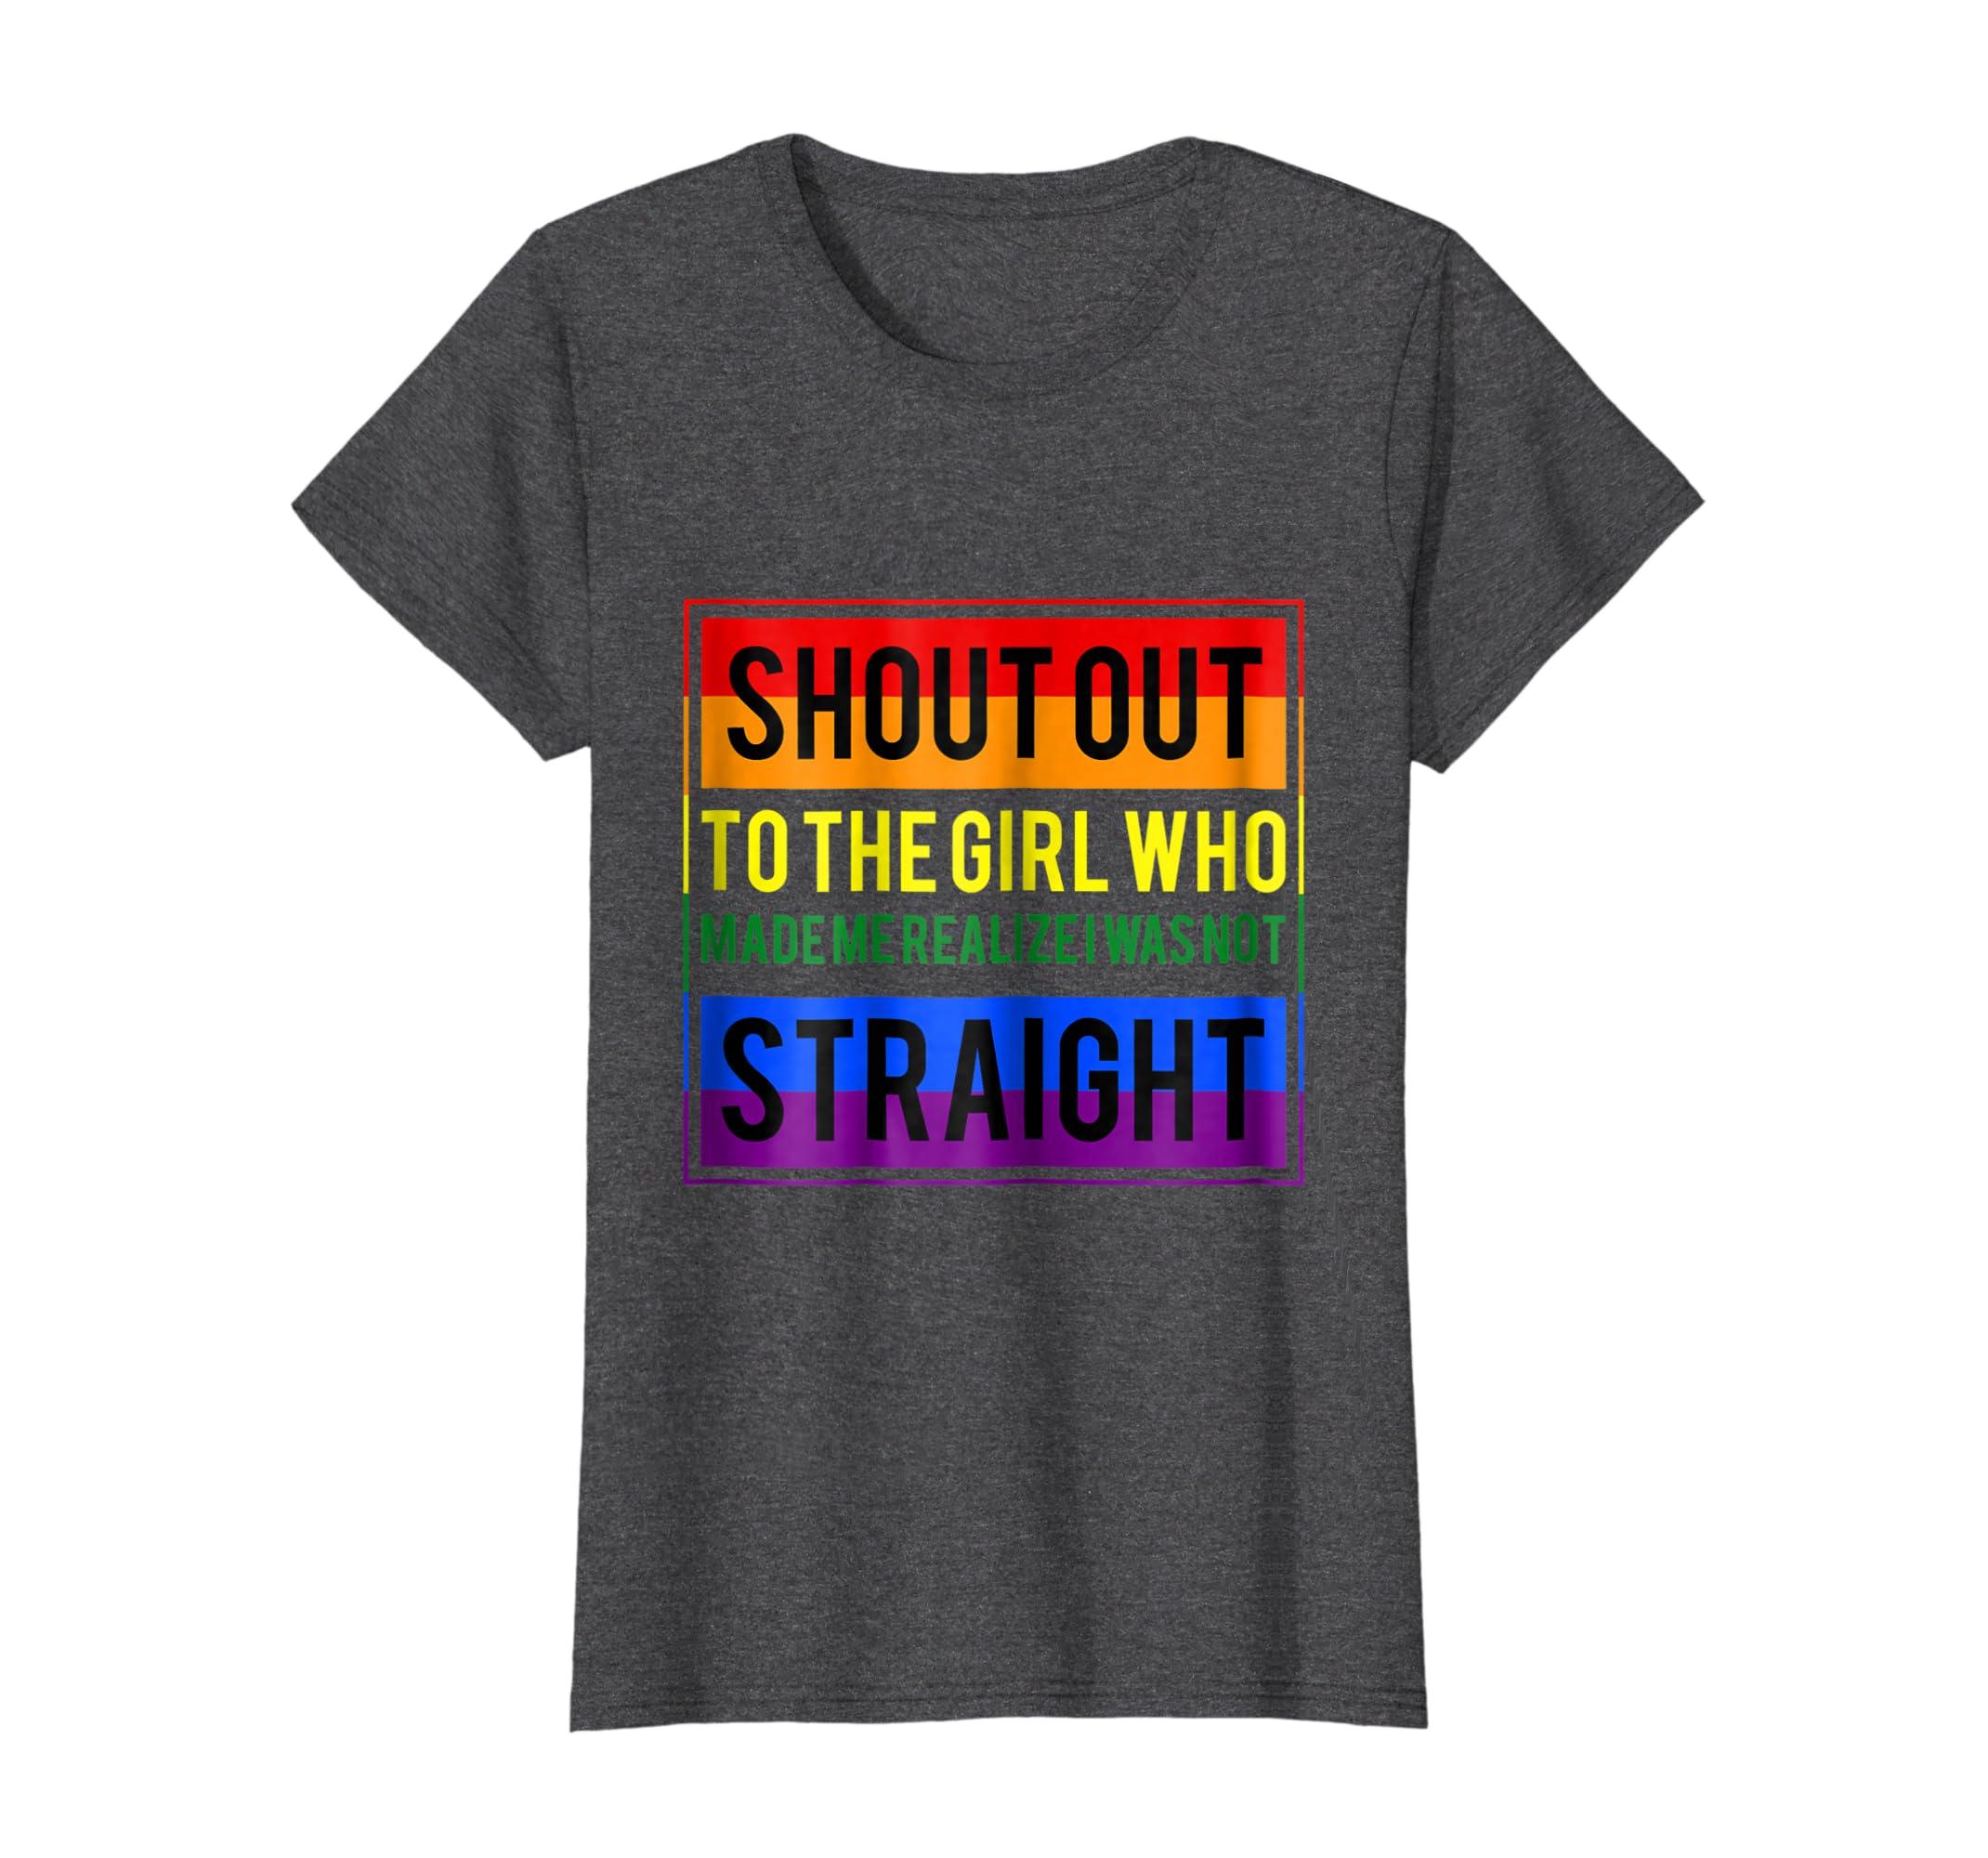 5fb16de719 Amazon.com: Lesbian T Shirt - Funny Lesbian Tee For Gay Pride: Clothing